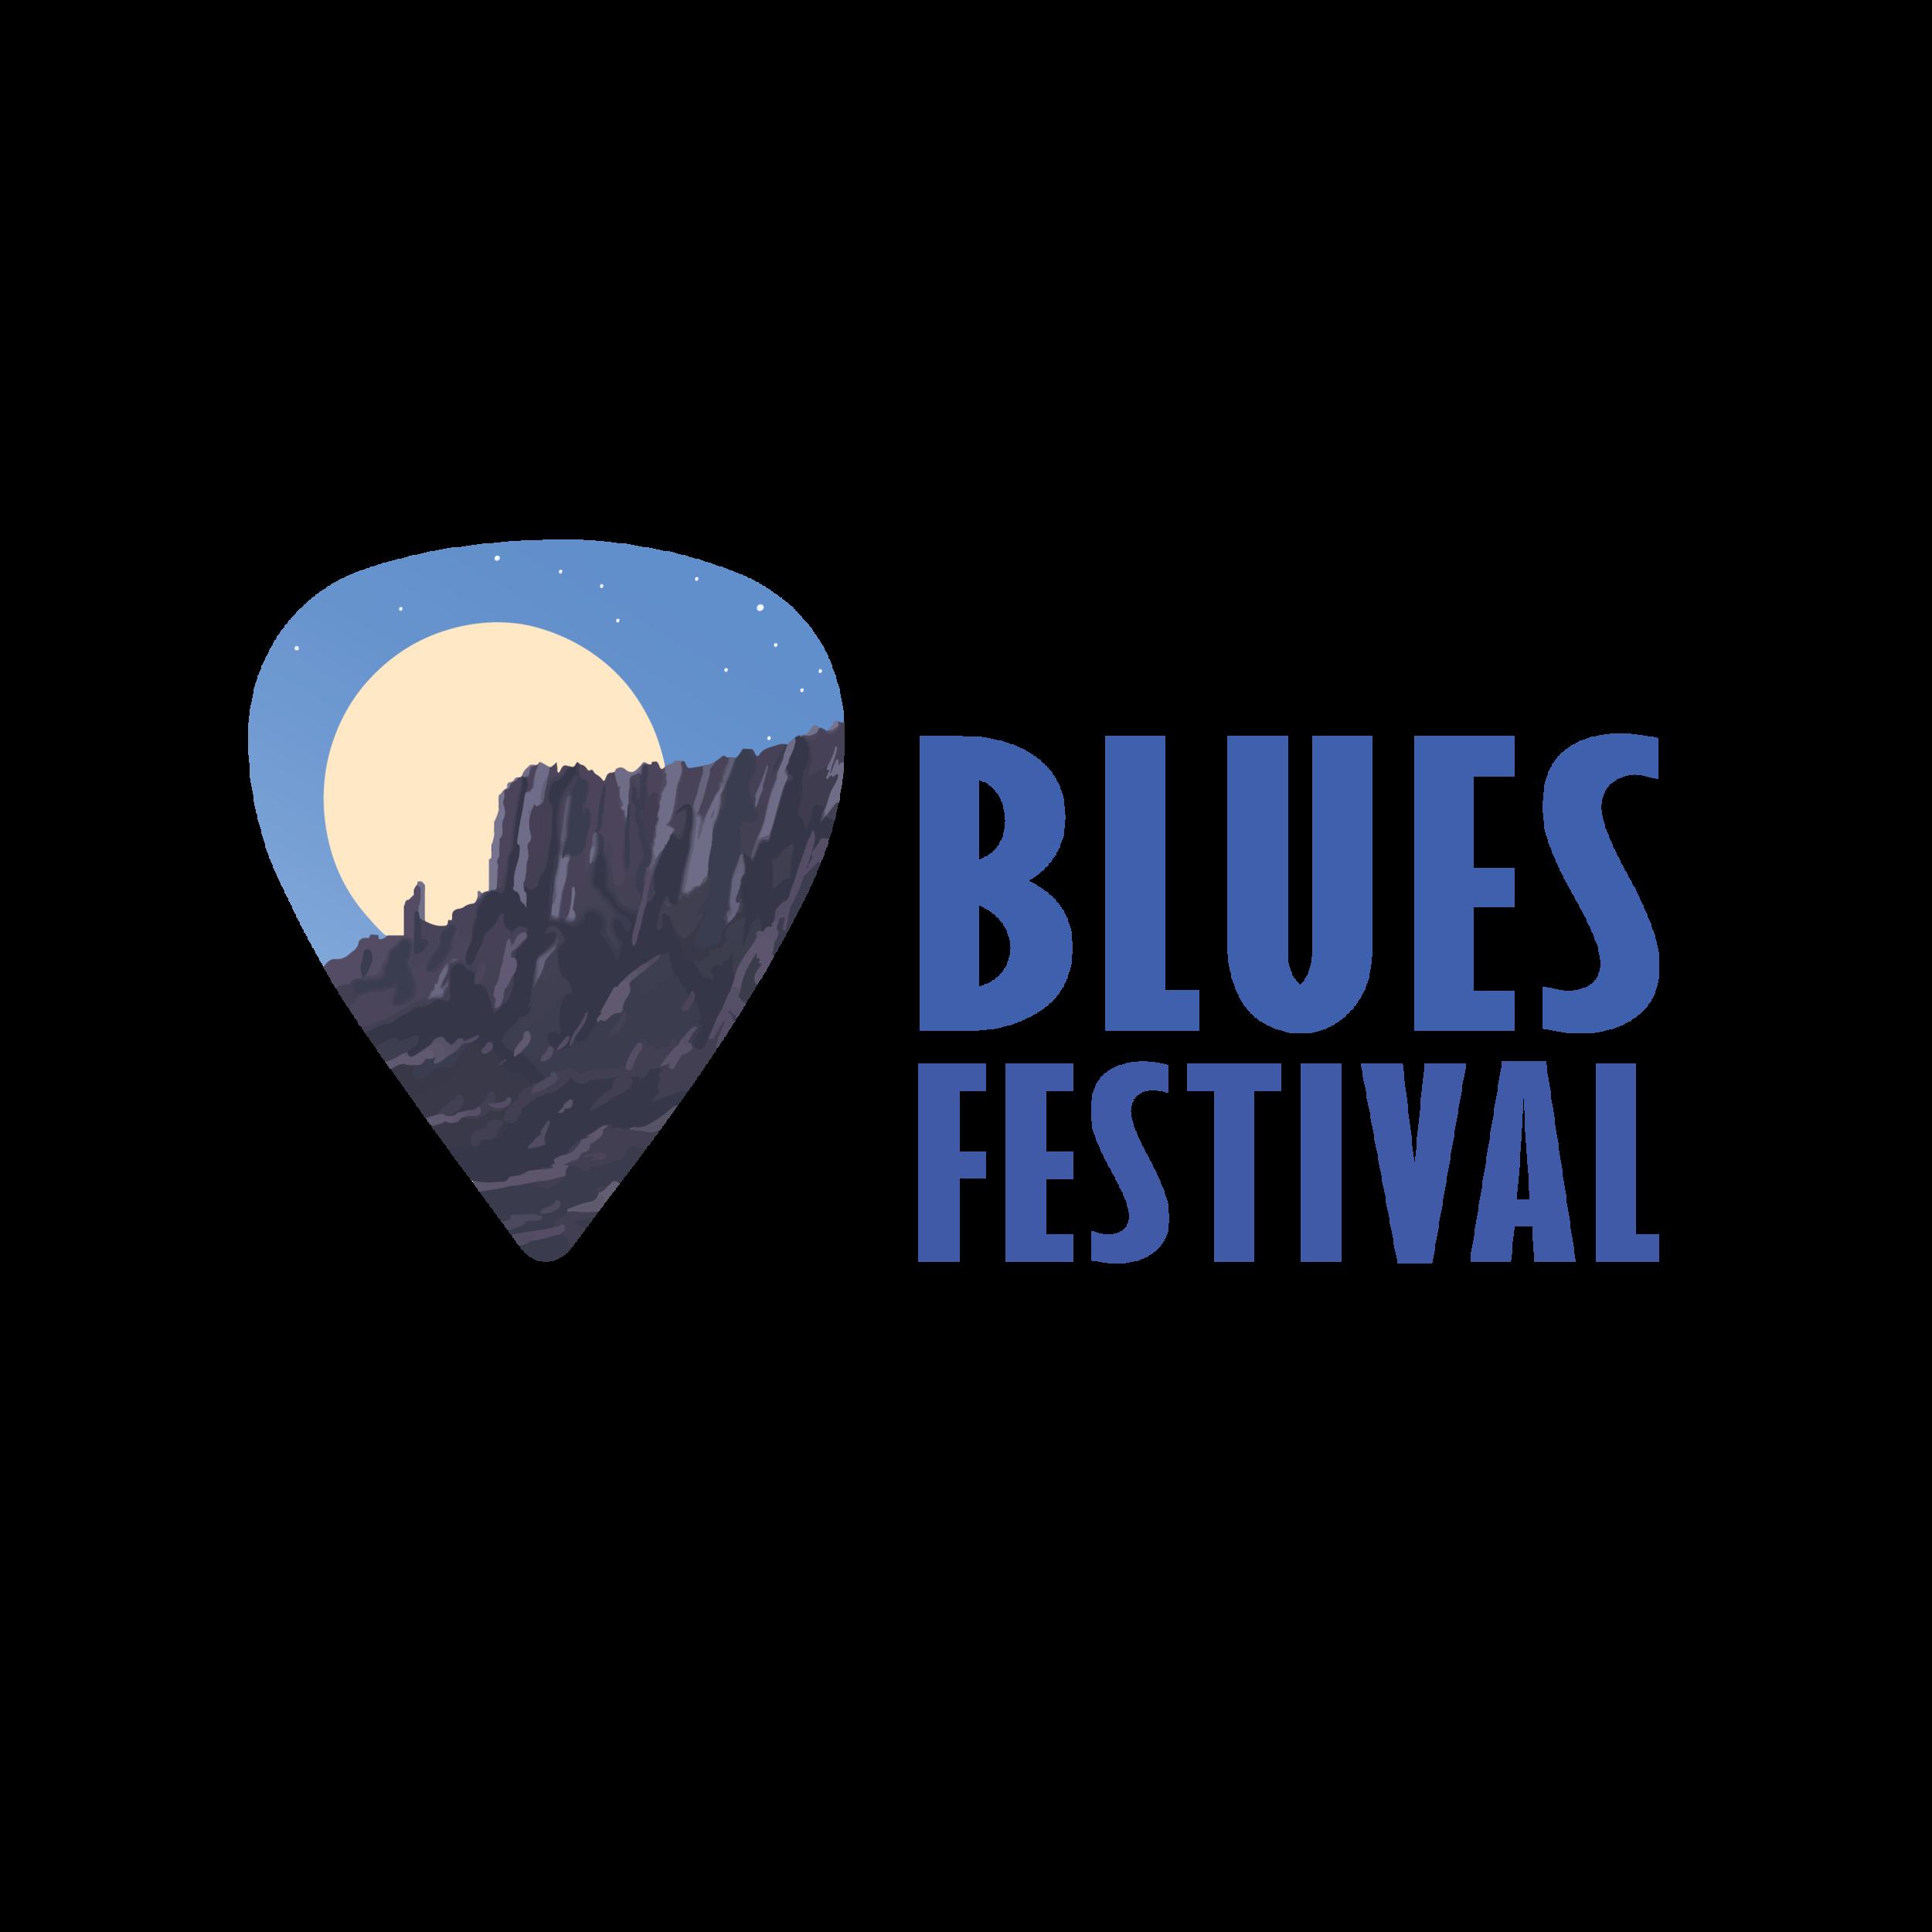 2017_BluesLogo_KneelingNun_NewHoriz_march 2017 kevin version.png